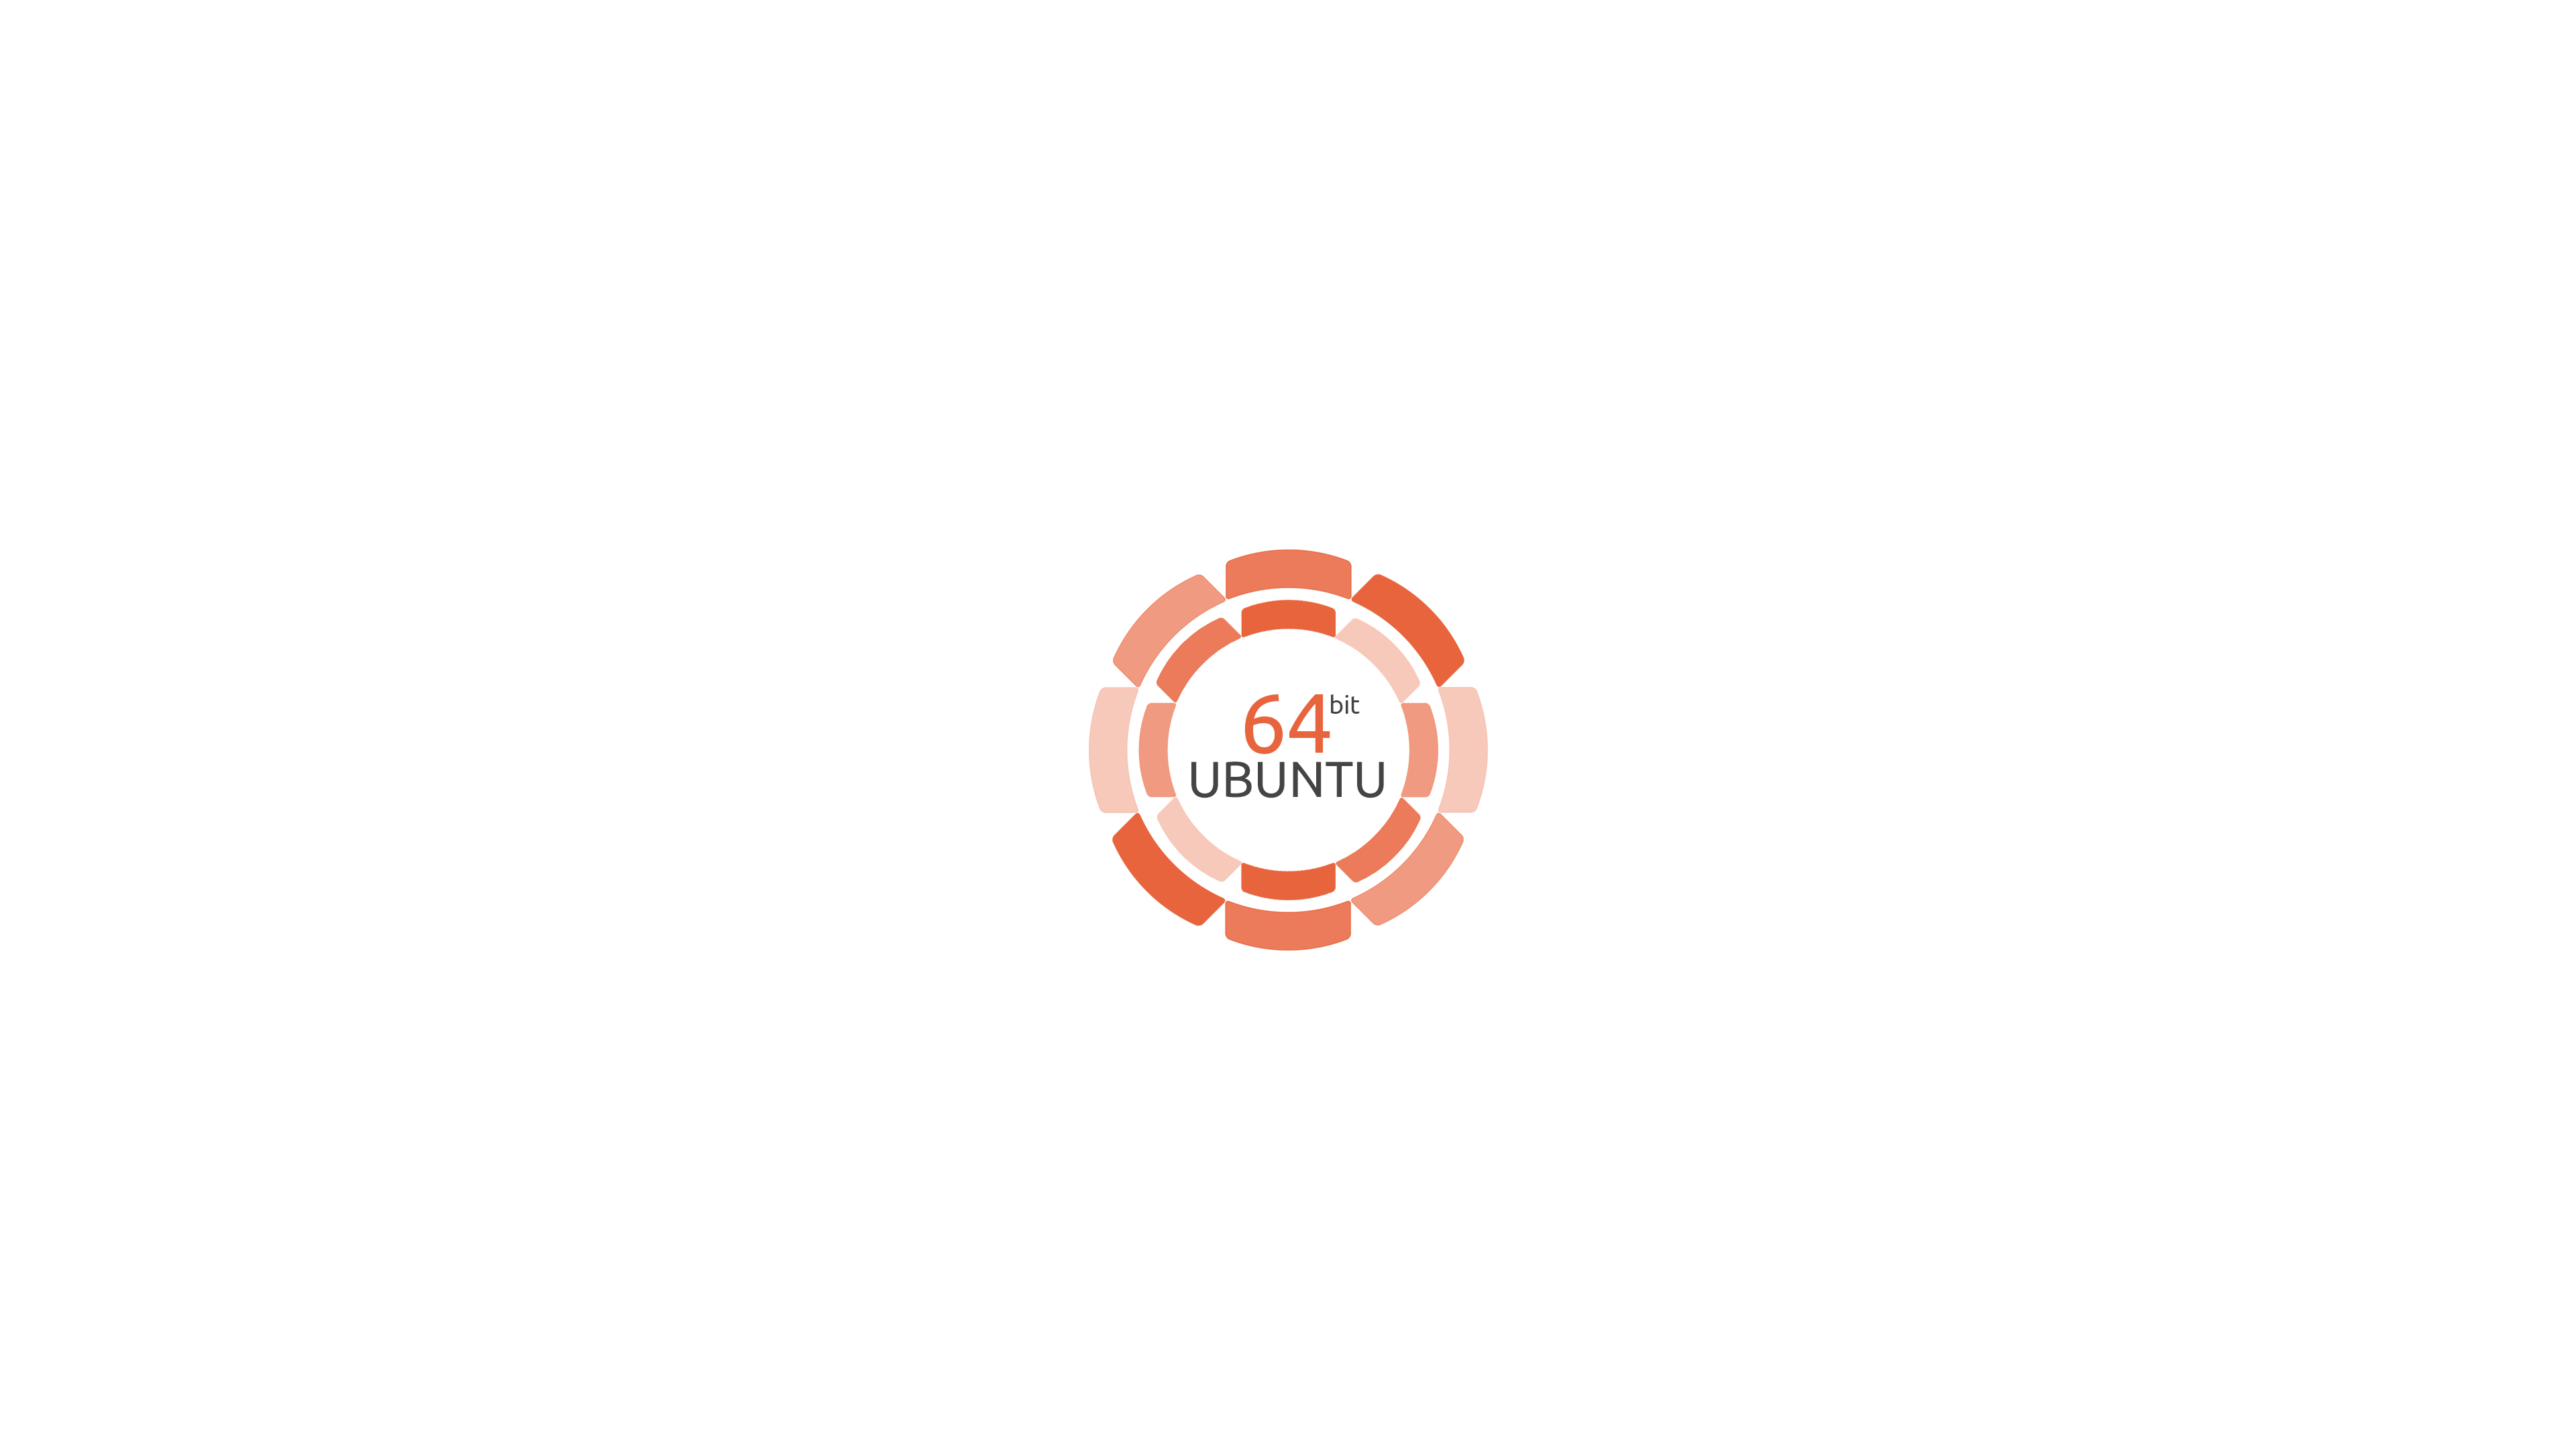 Ubuntu-64bit by dngerdave